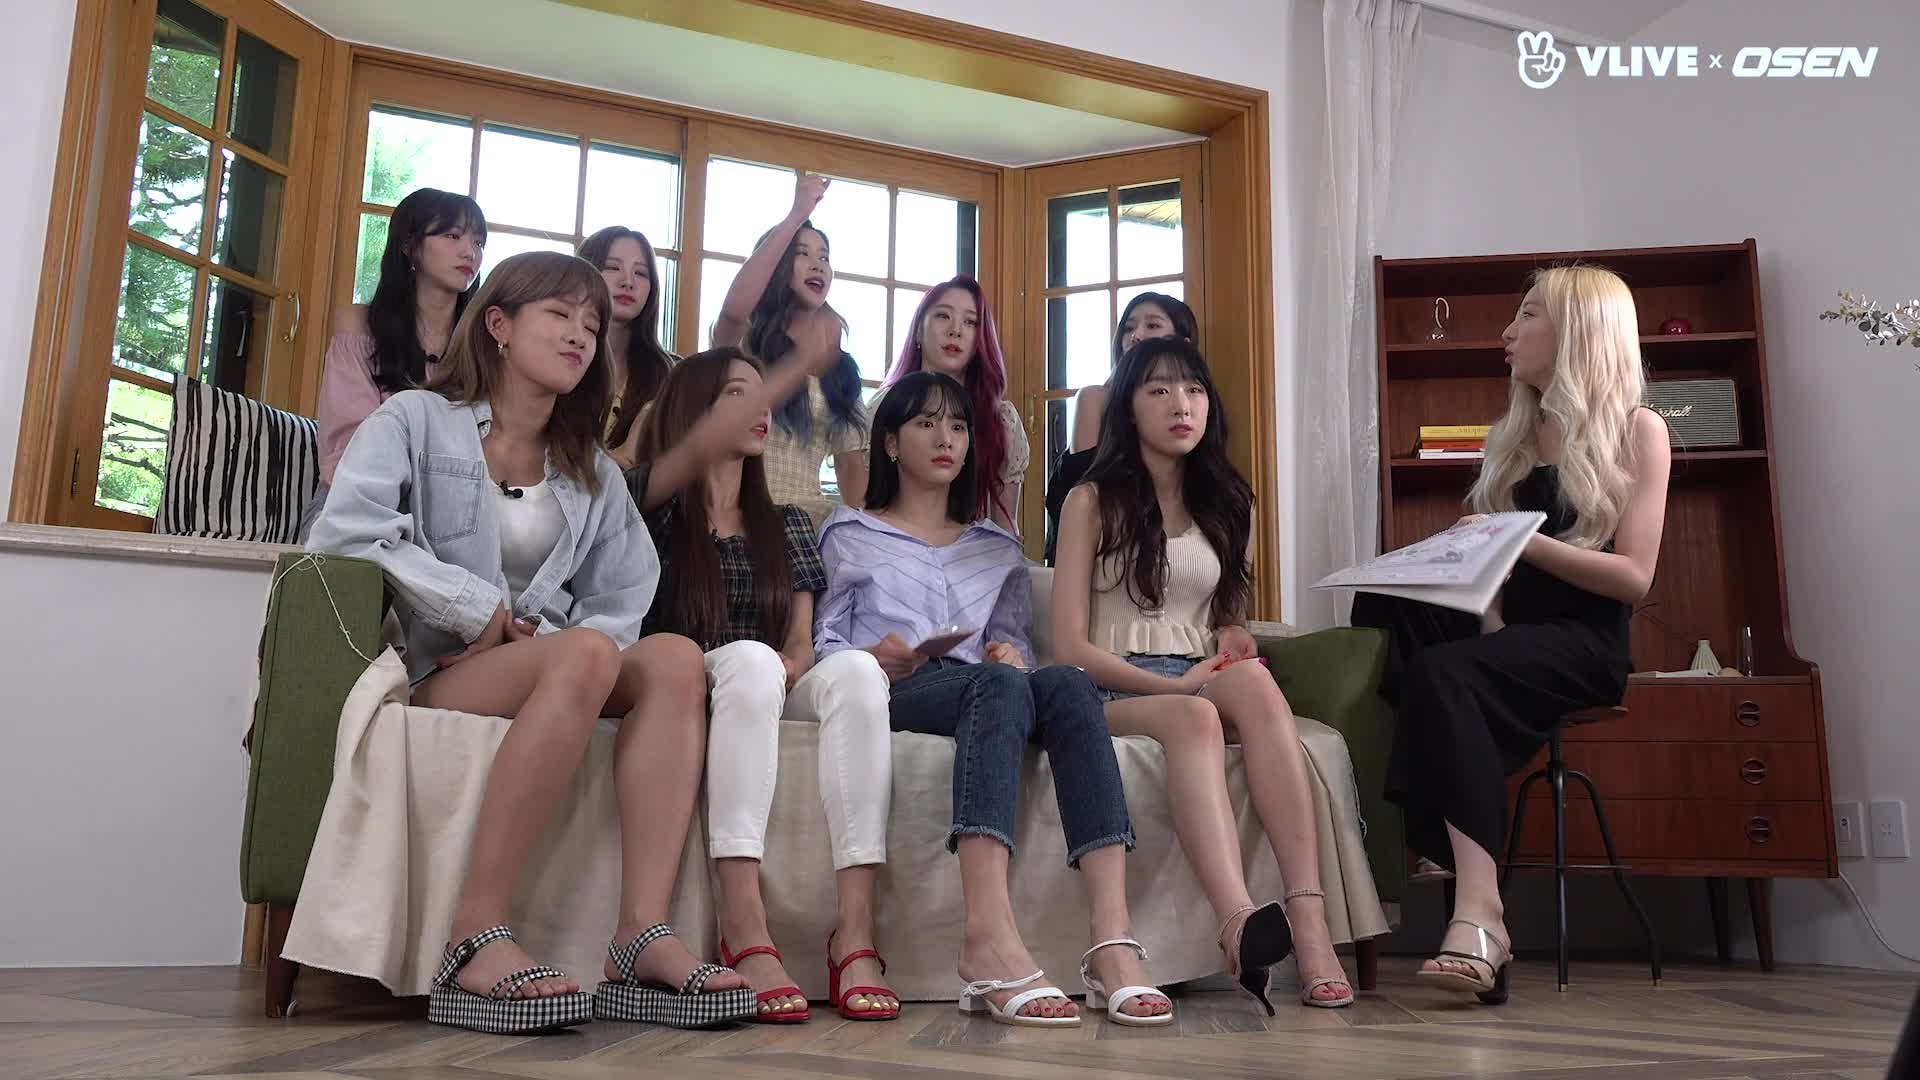 WJSN 우주소녀, 드디어 '스타로드' 첫방송 #EP 01